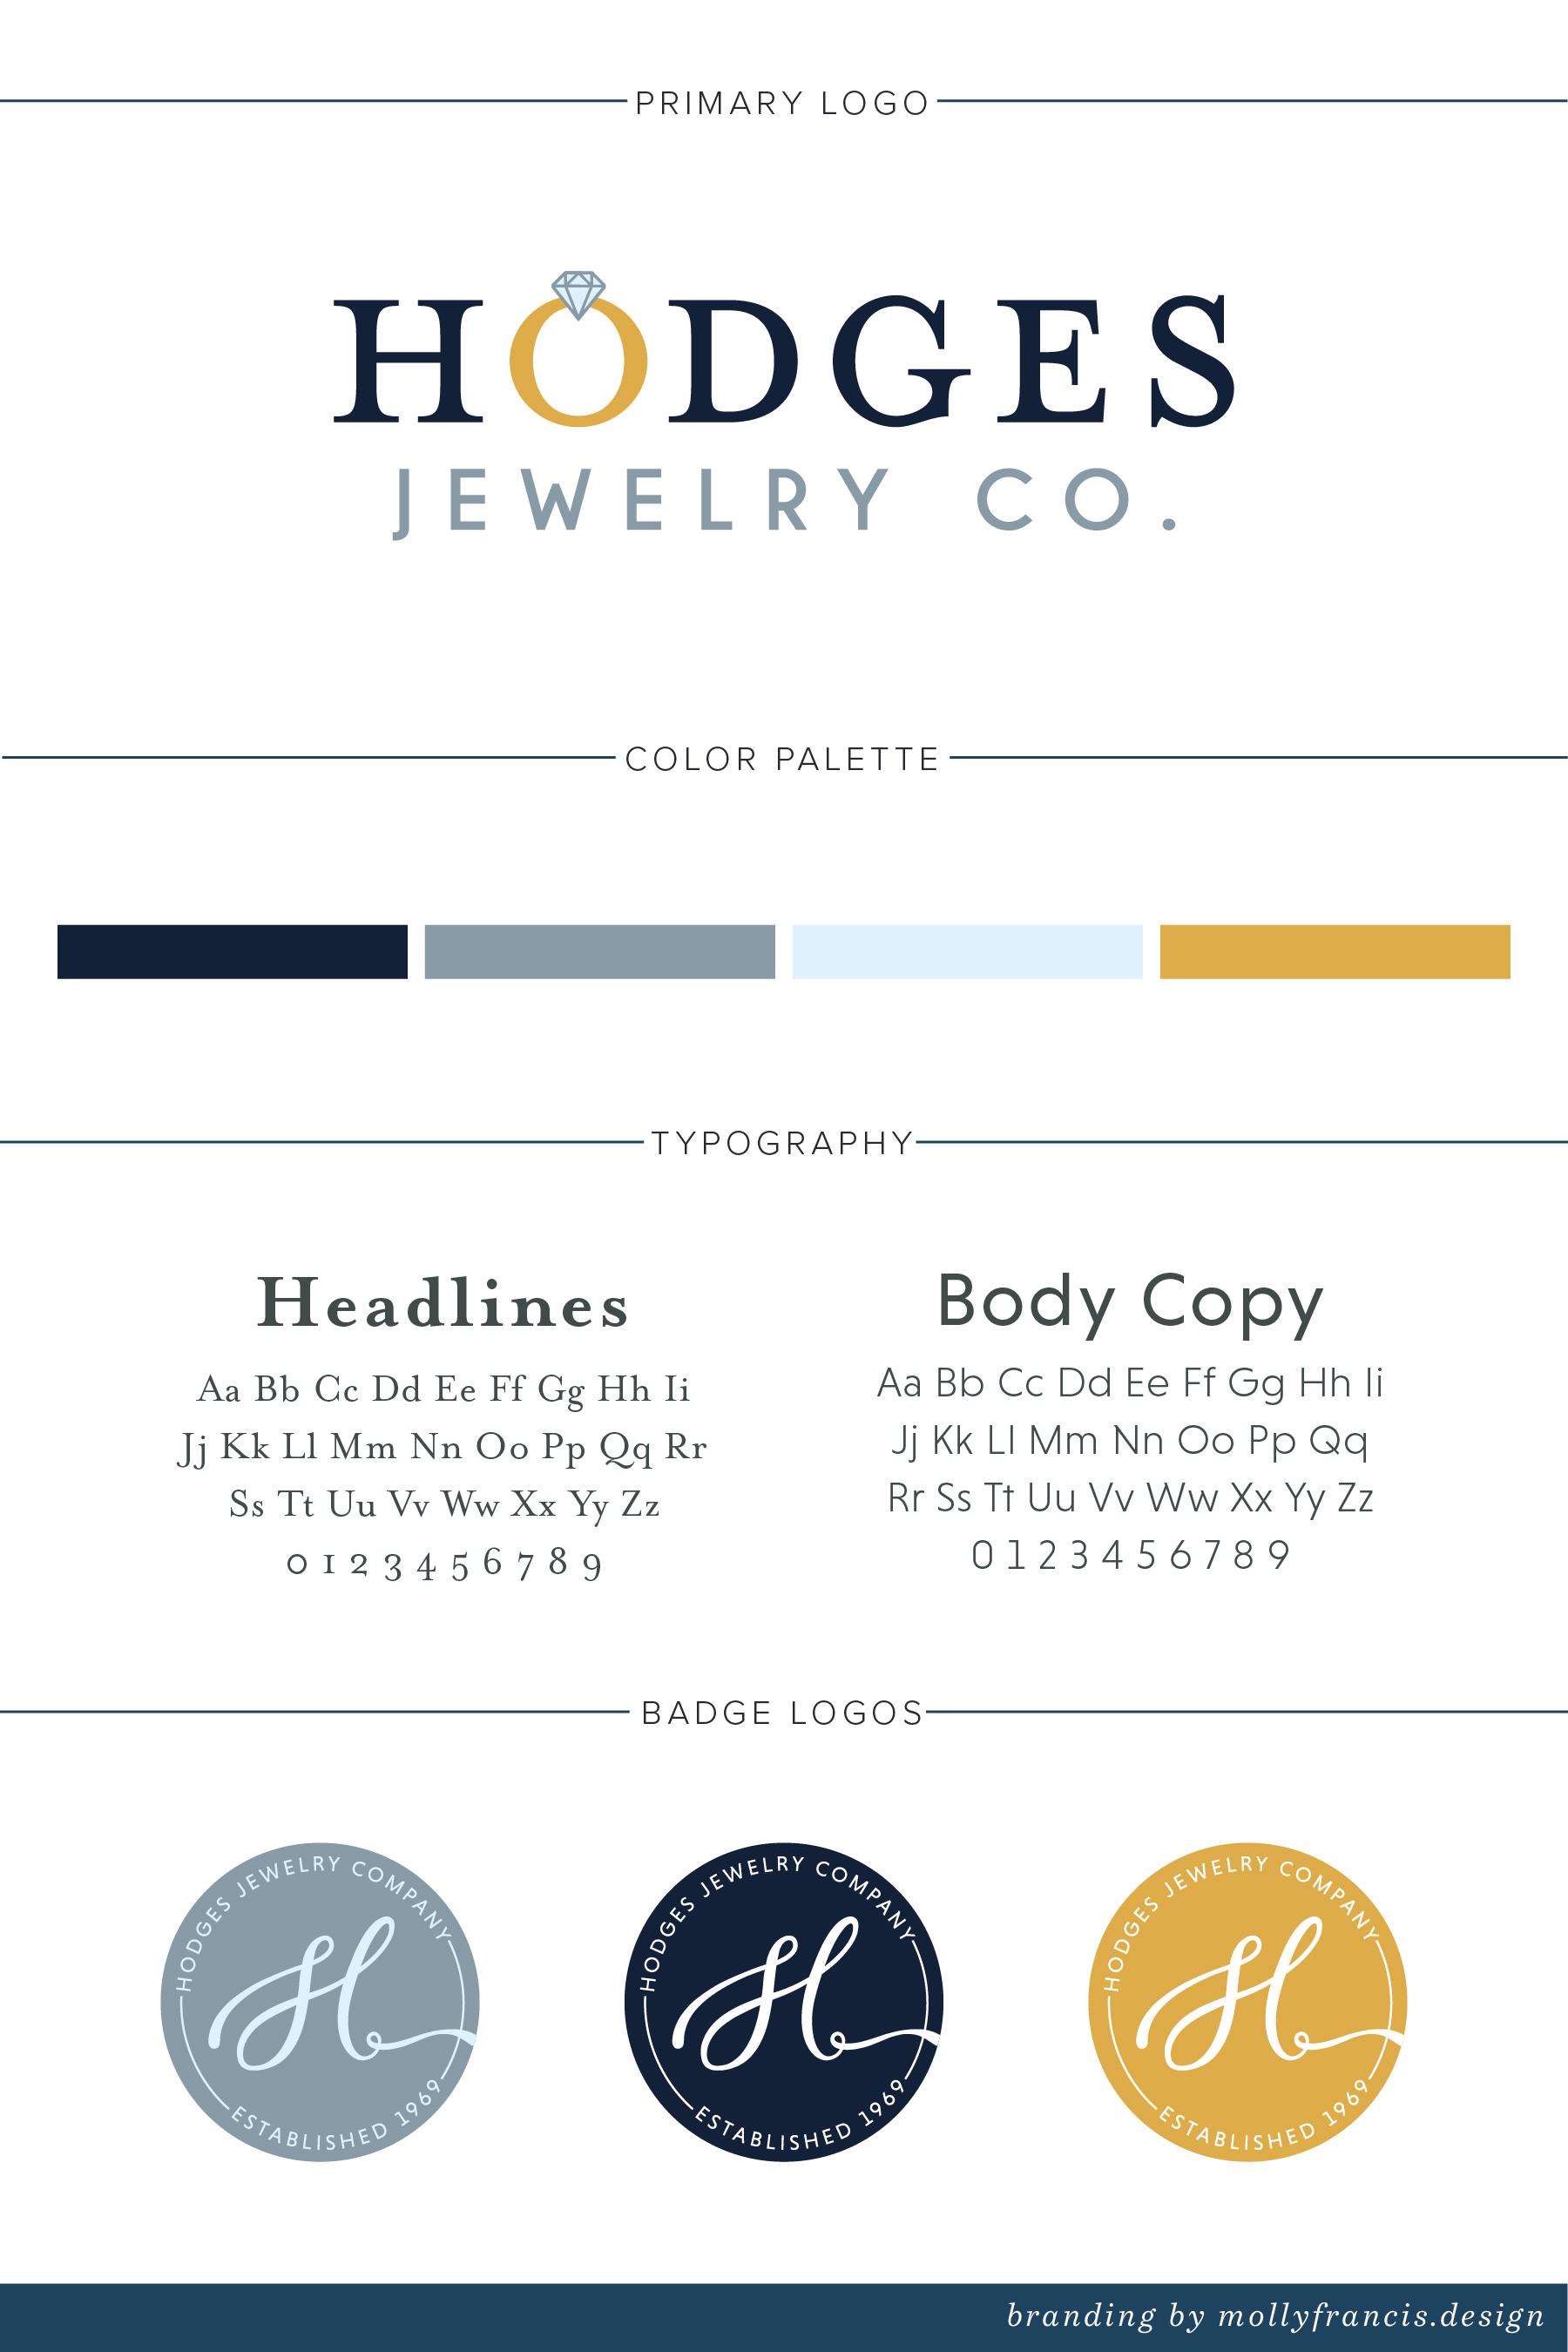 HodgesJewelry_Brand-Identity.jpg